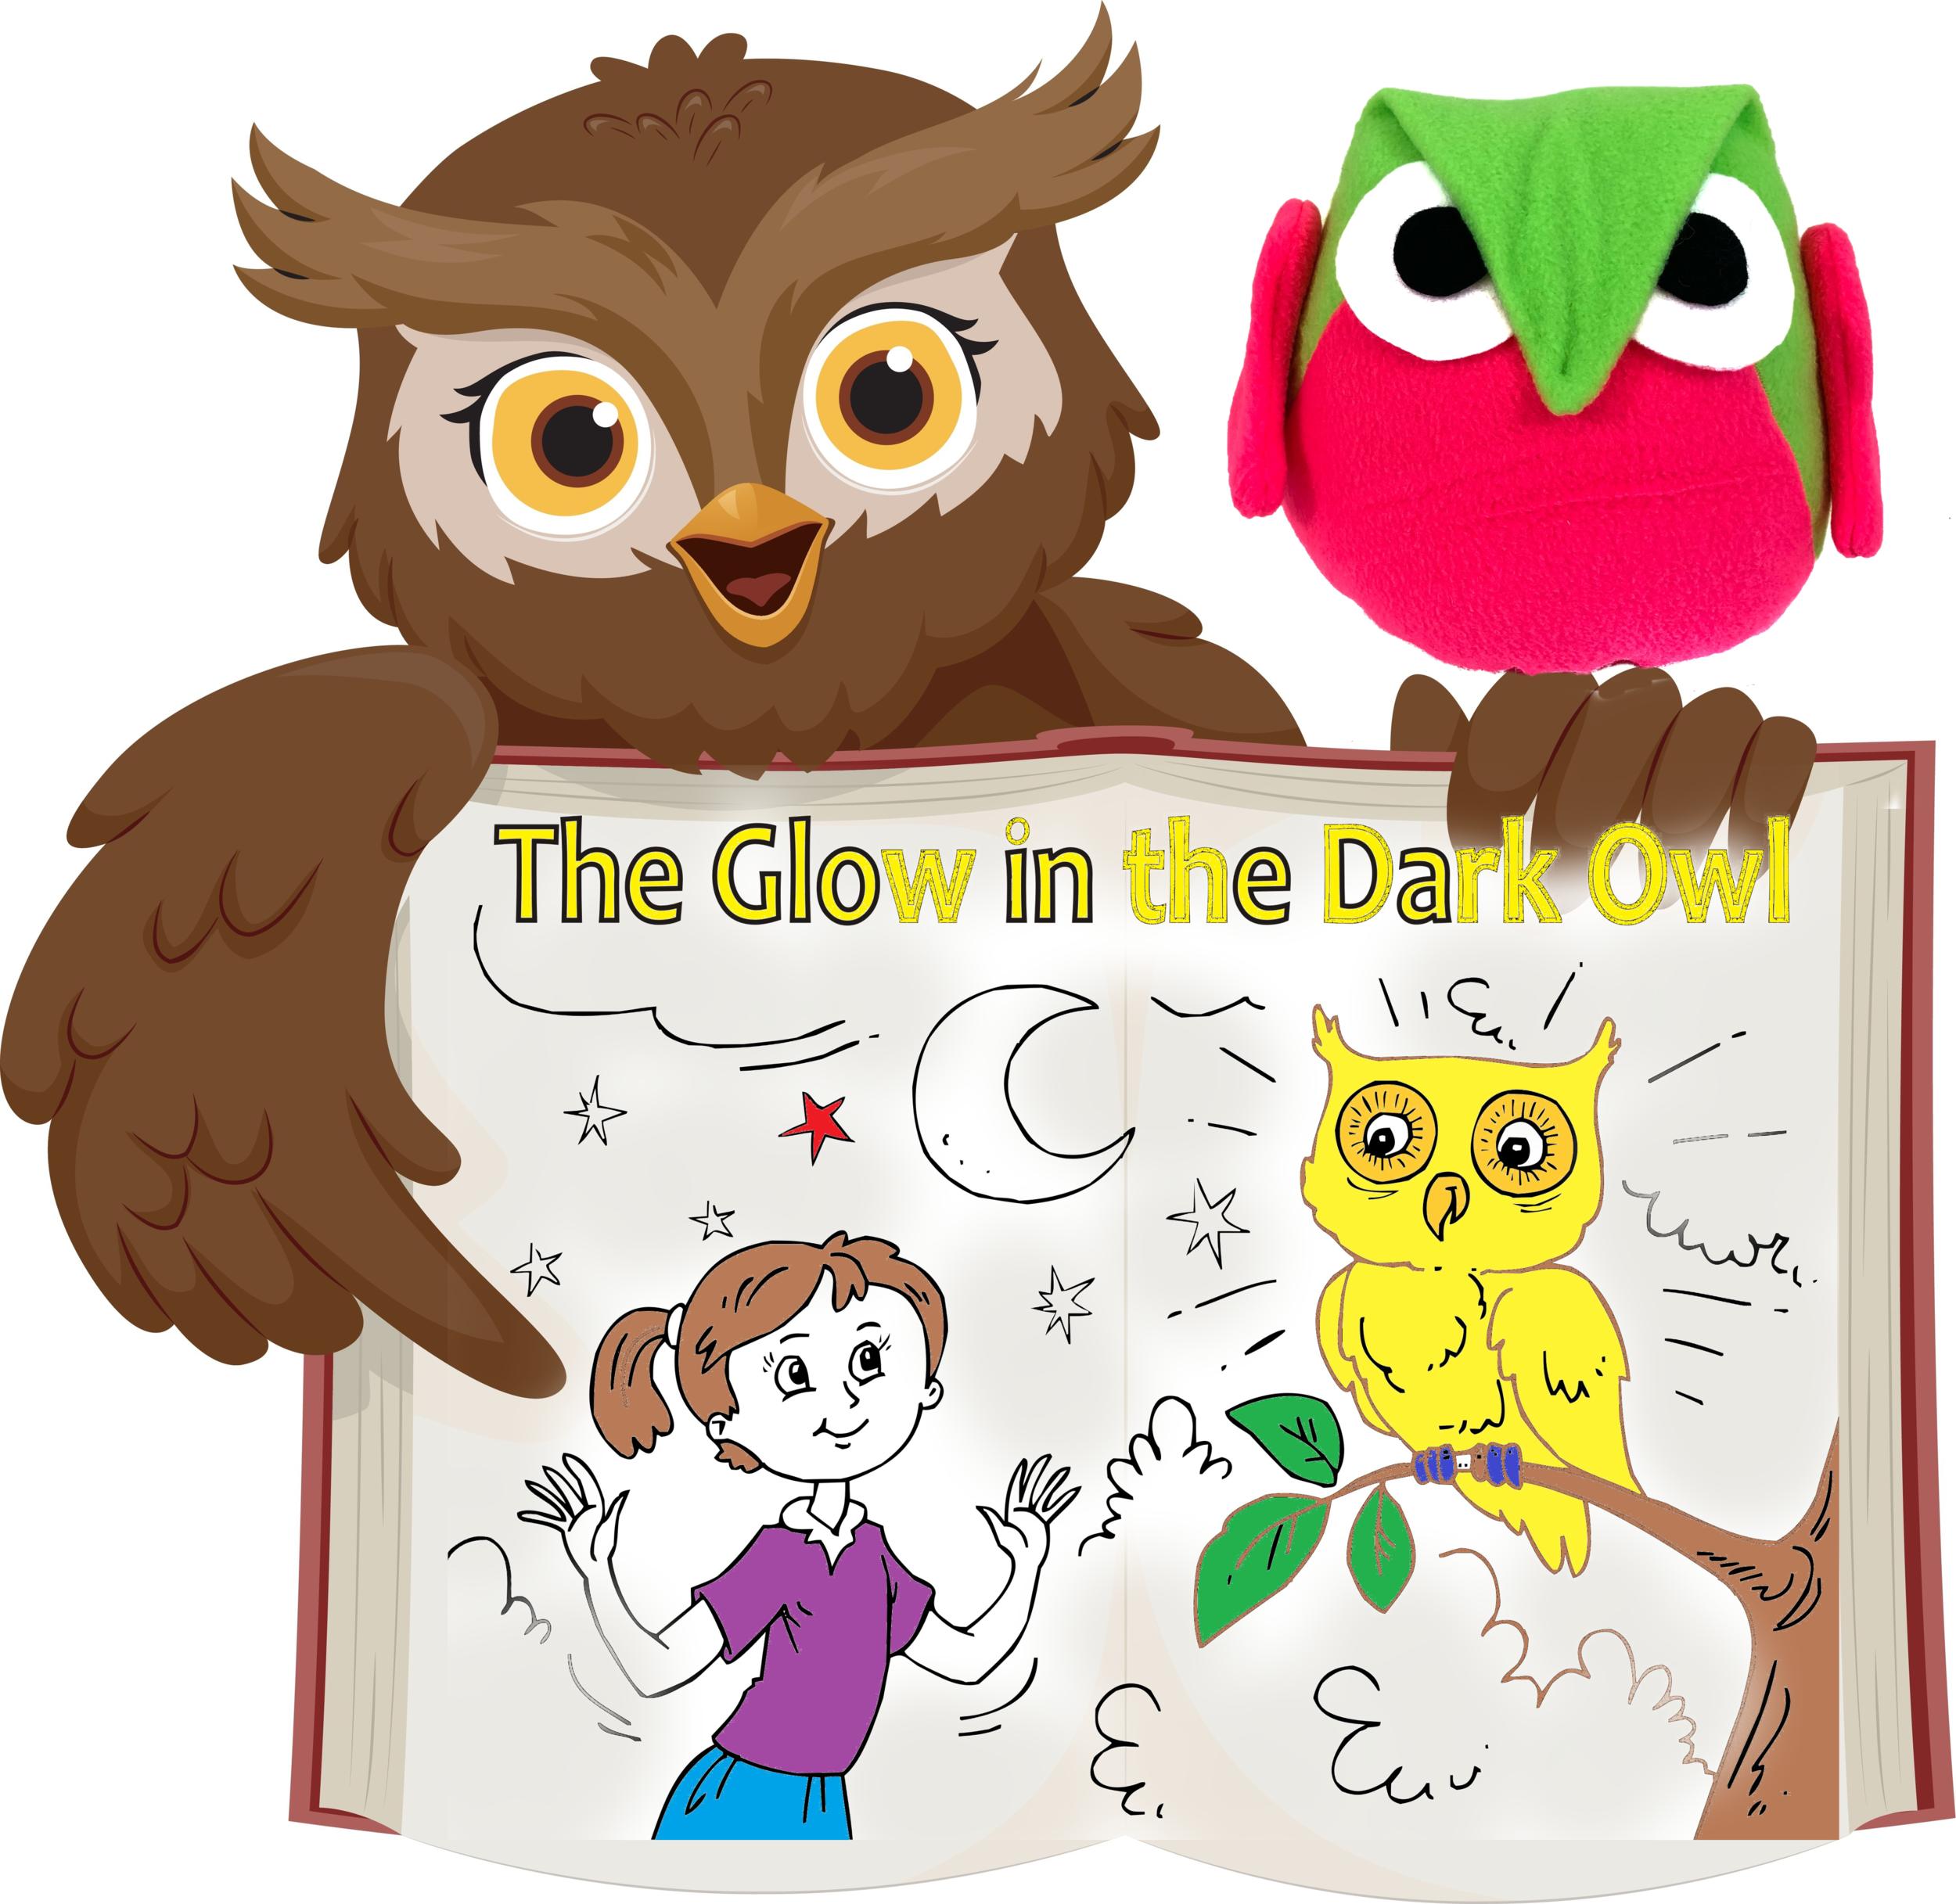 The Glow in the Dark Owl -